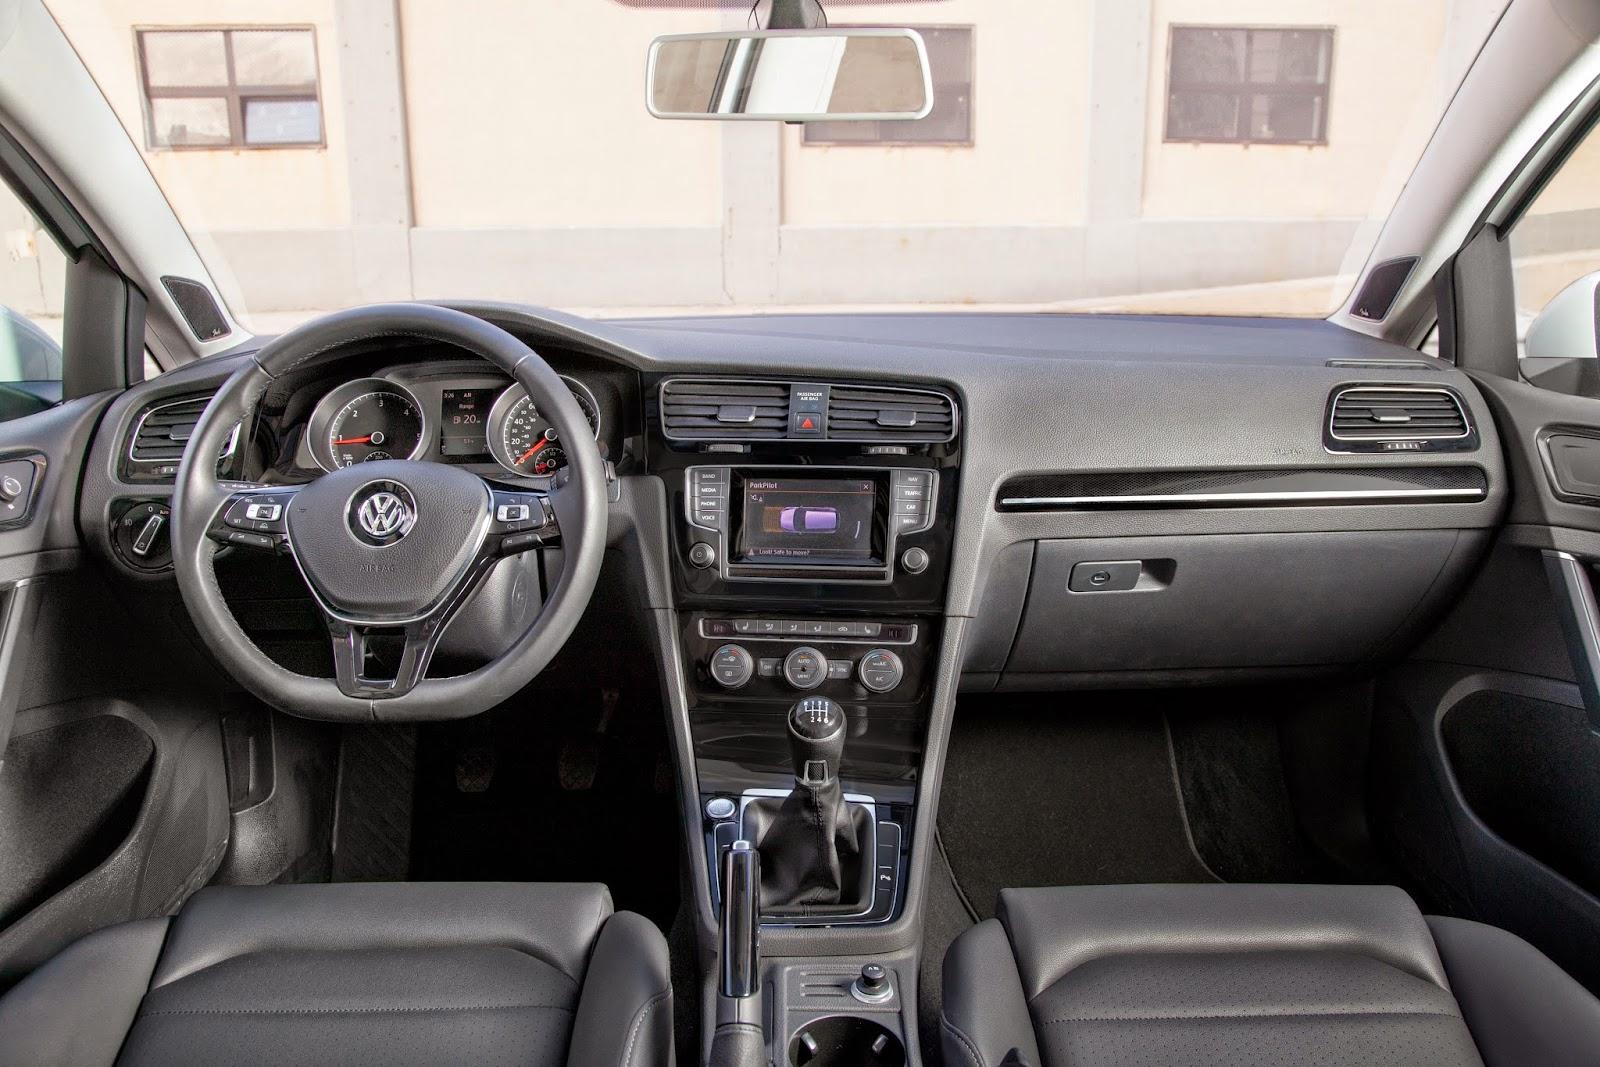 Interior view of 2015 Volkswagen Golf TDI